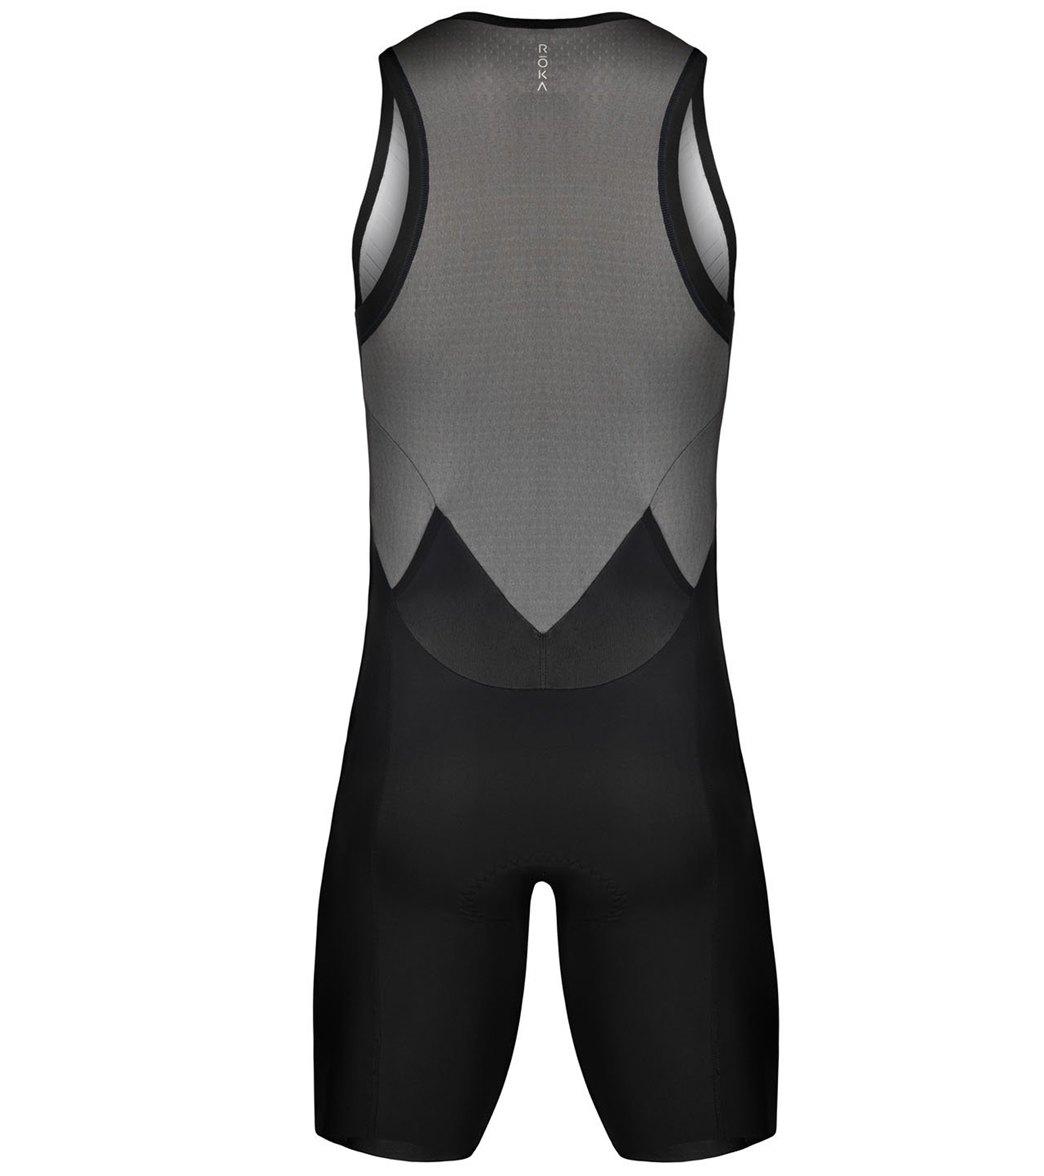 a33aa3a884 ROKA Men's Elite Aero II Sleeveless Tri Suit at SwimOutlet.com ...